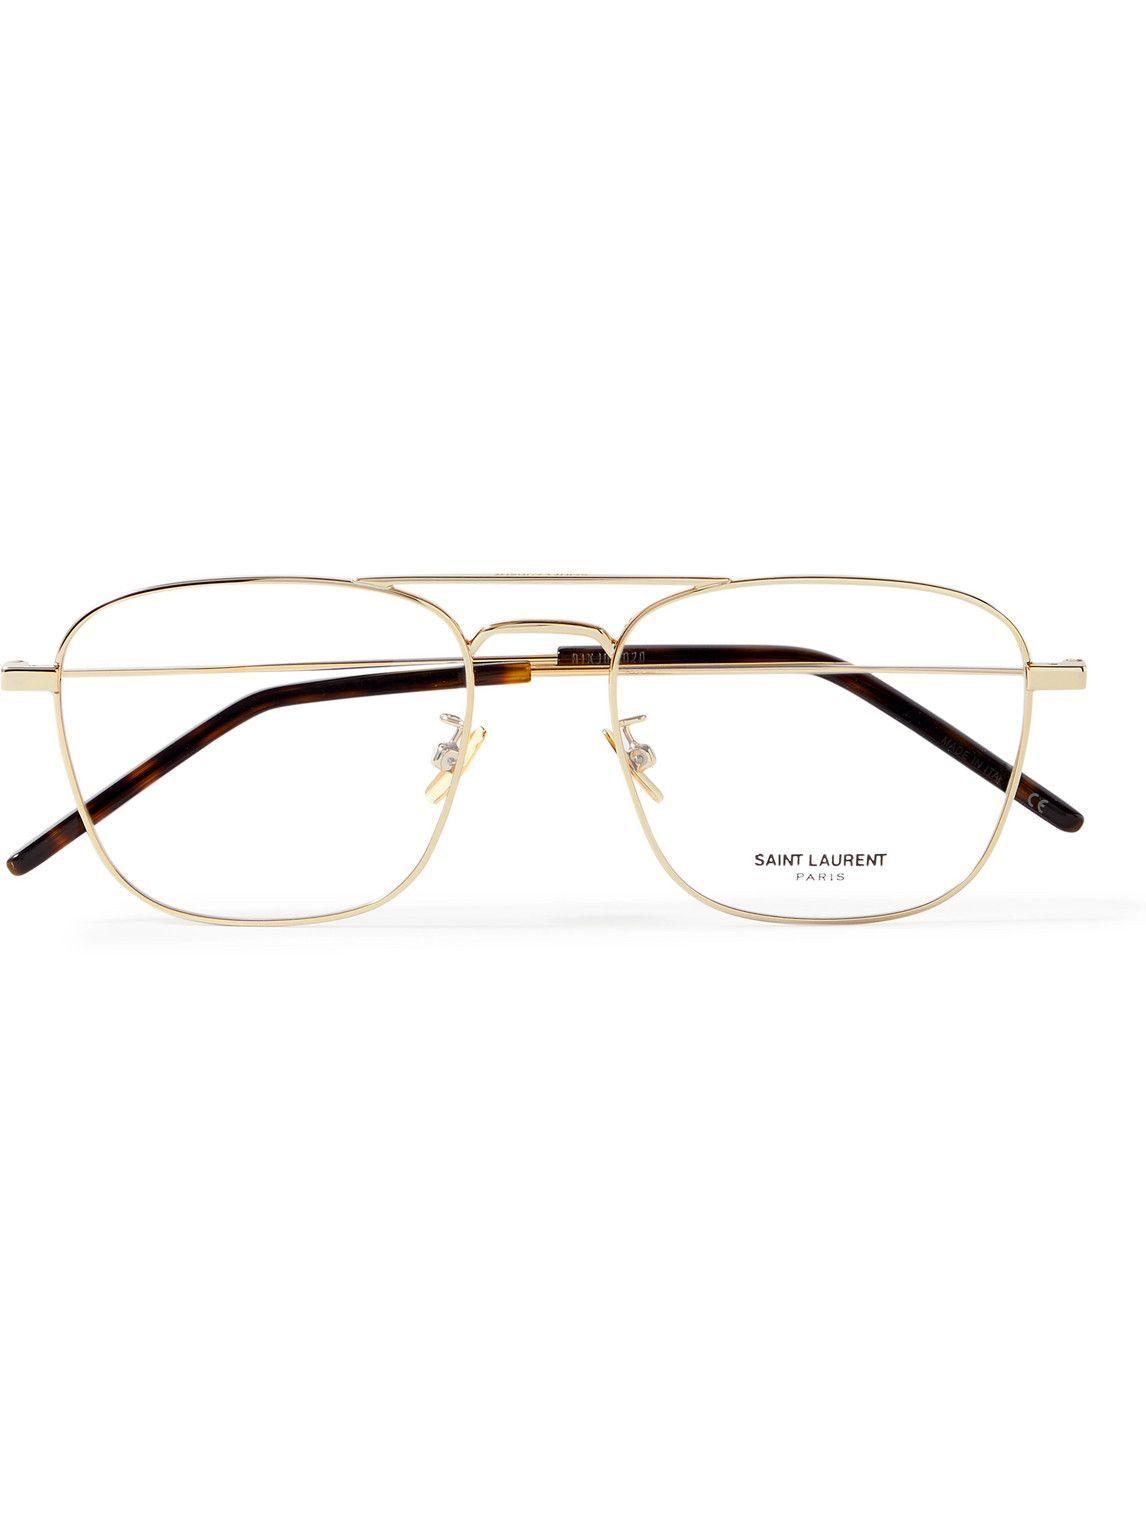 Photo: SAINT LAURENT - Aviator-Style Gold-Tone Optical Glasses